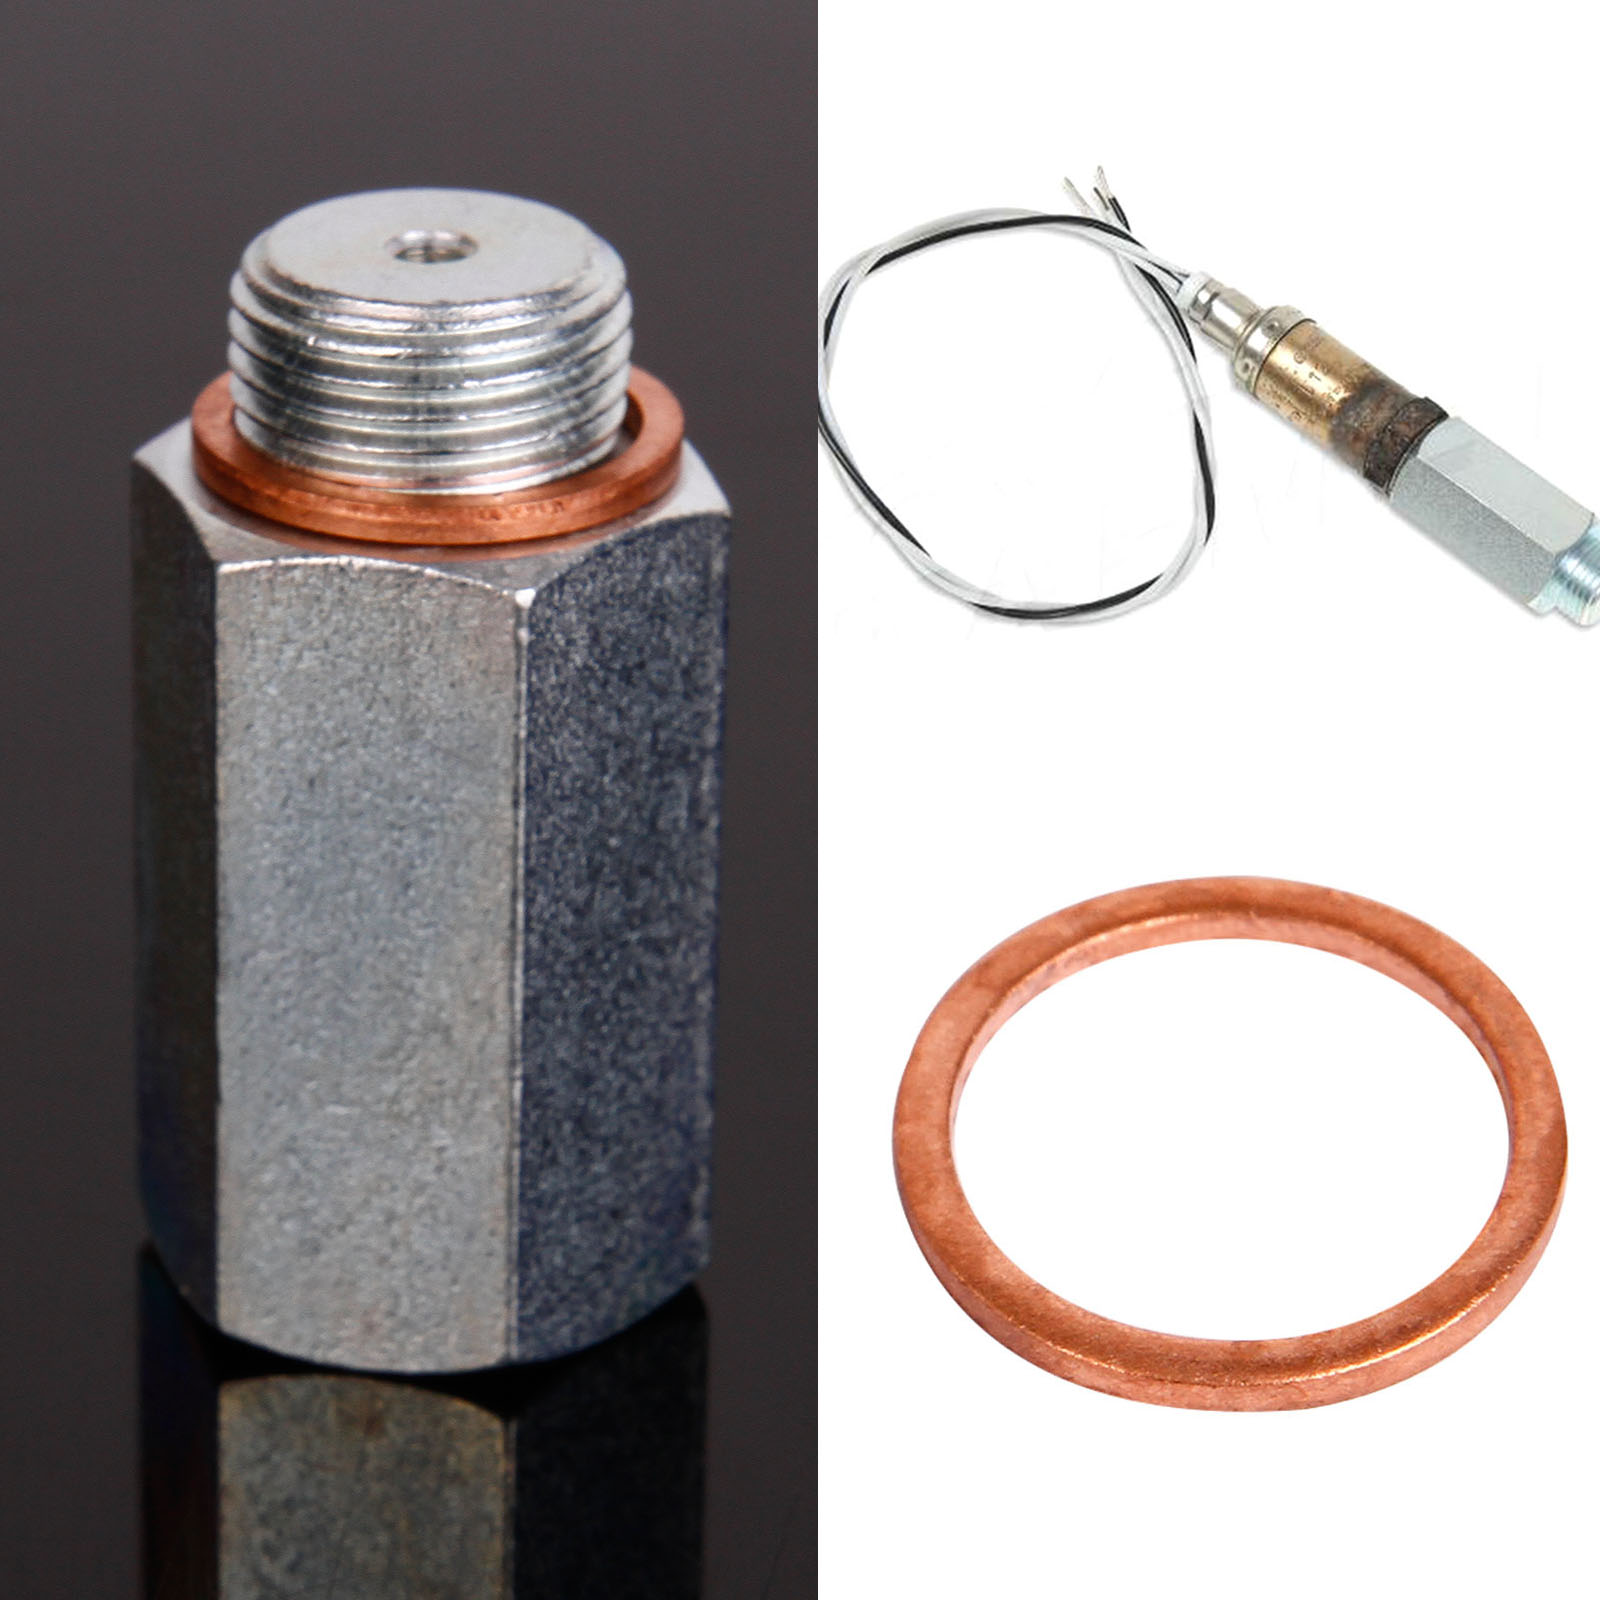 M18x1.5 Lambda O2 Oxygen Sensor Extension Extender Spacer Exhaust Silver